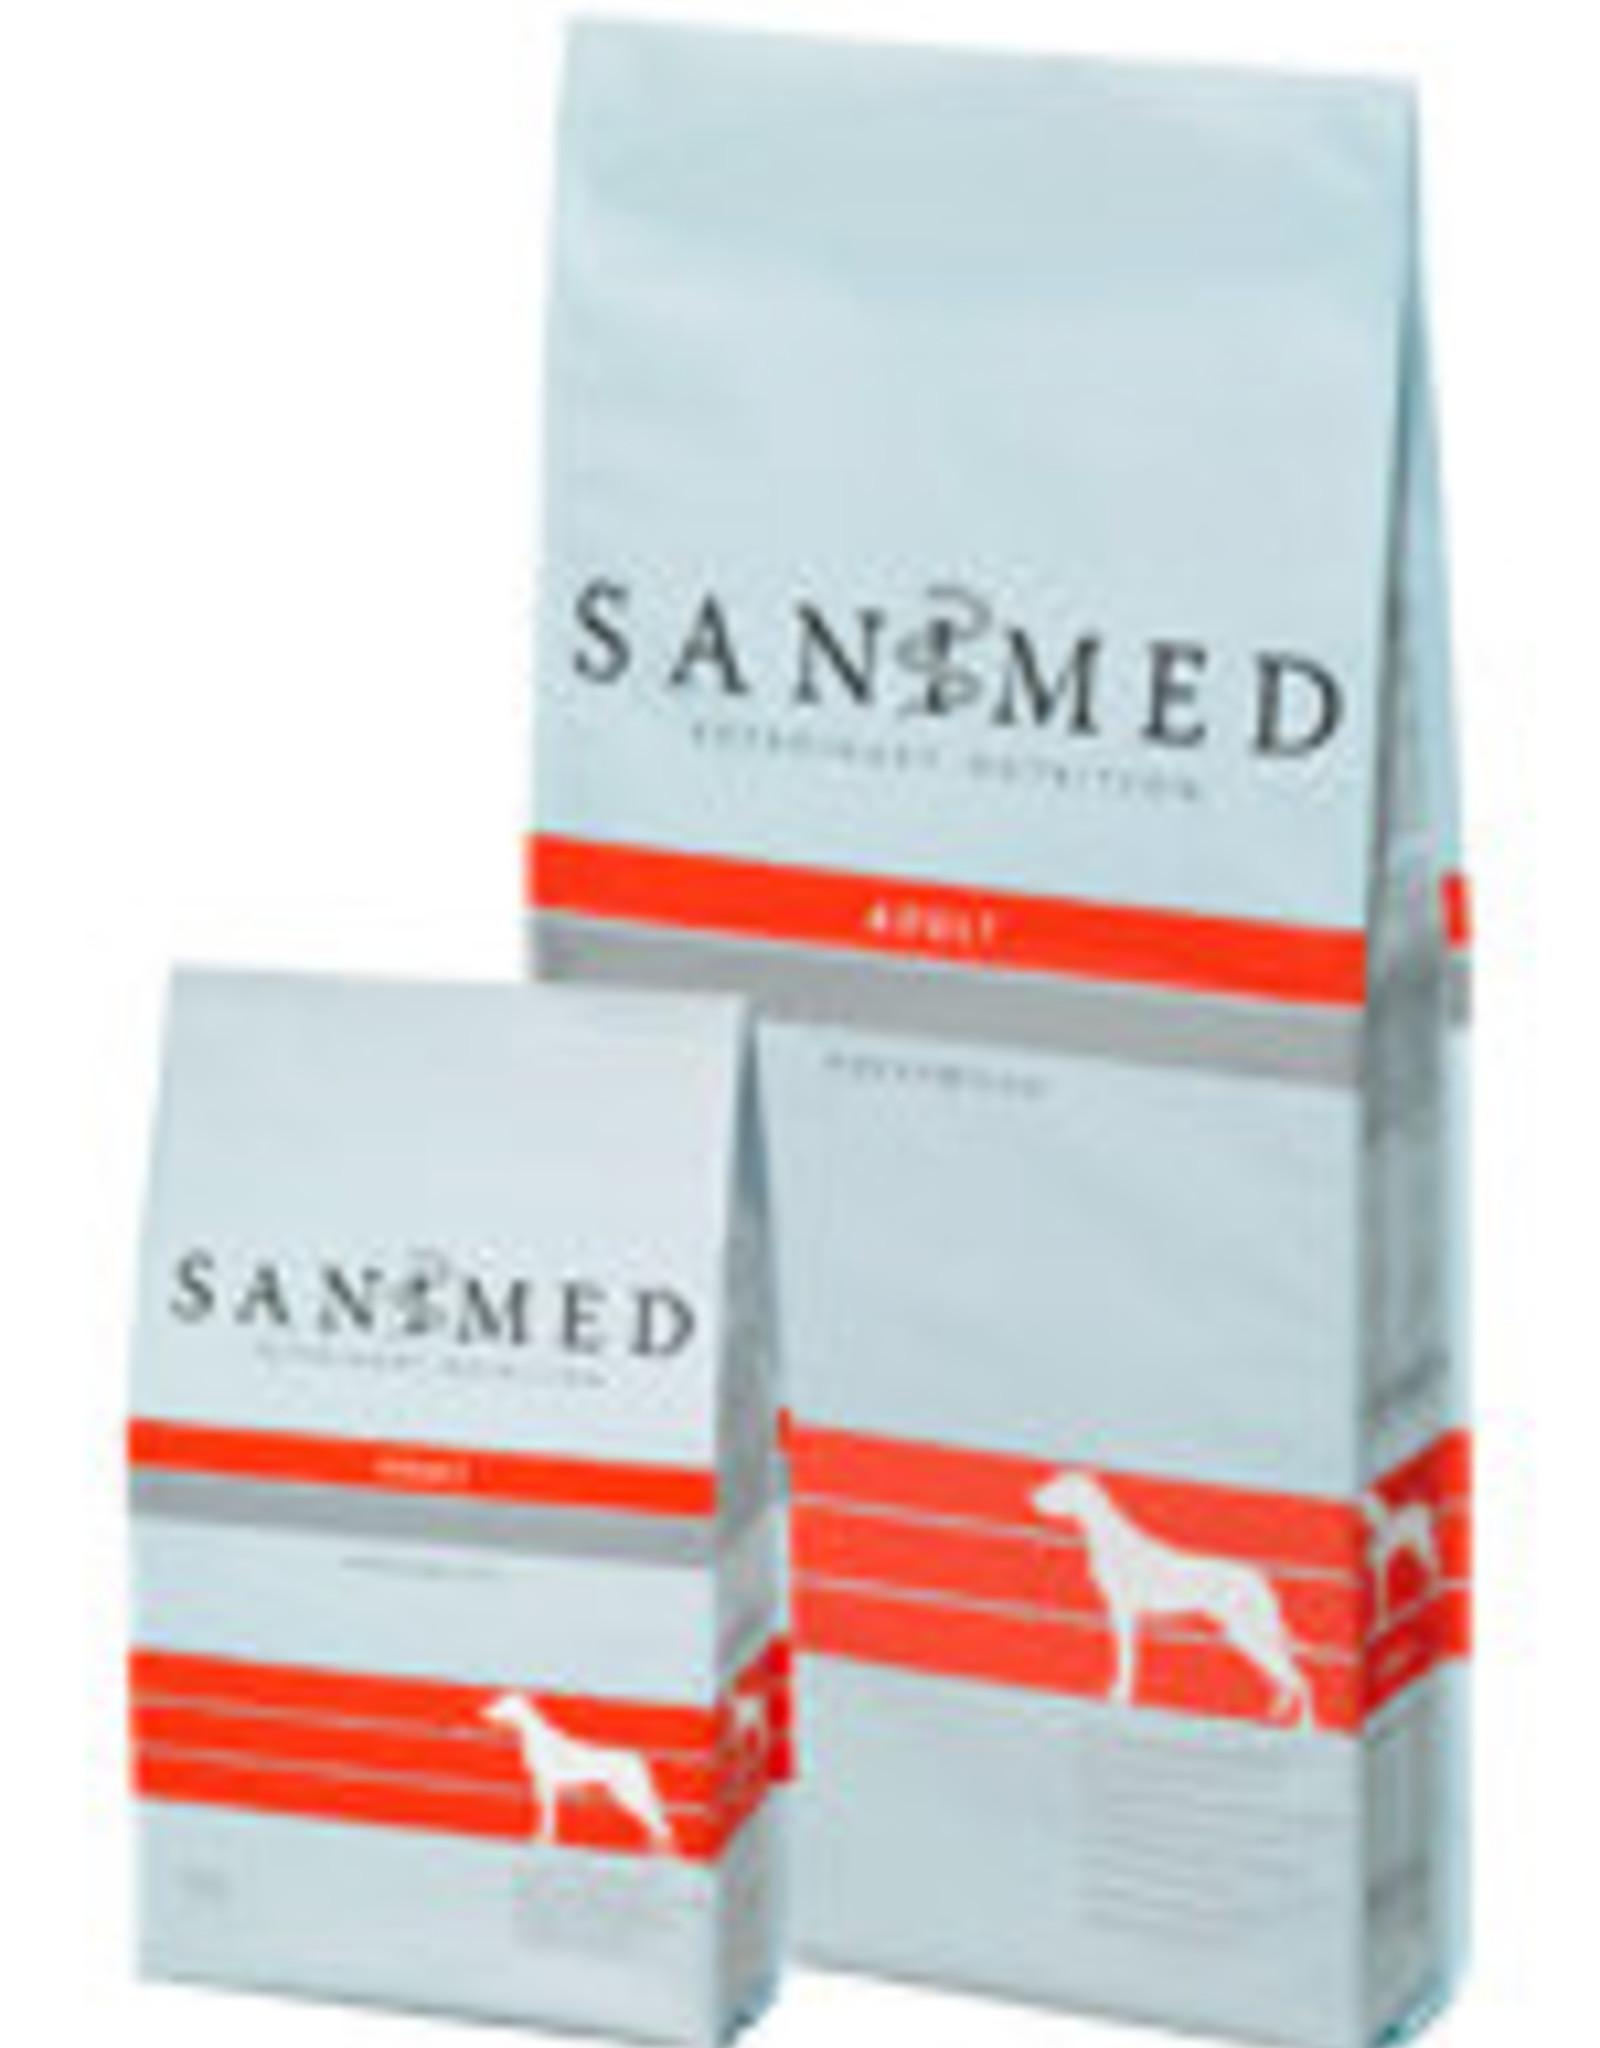 Sanimed Sanimed Preventive Chien Adult 3kg